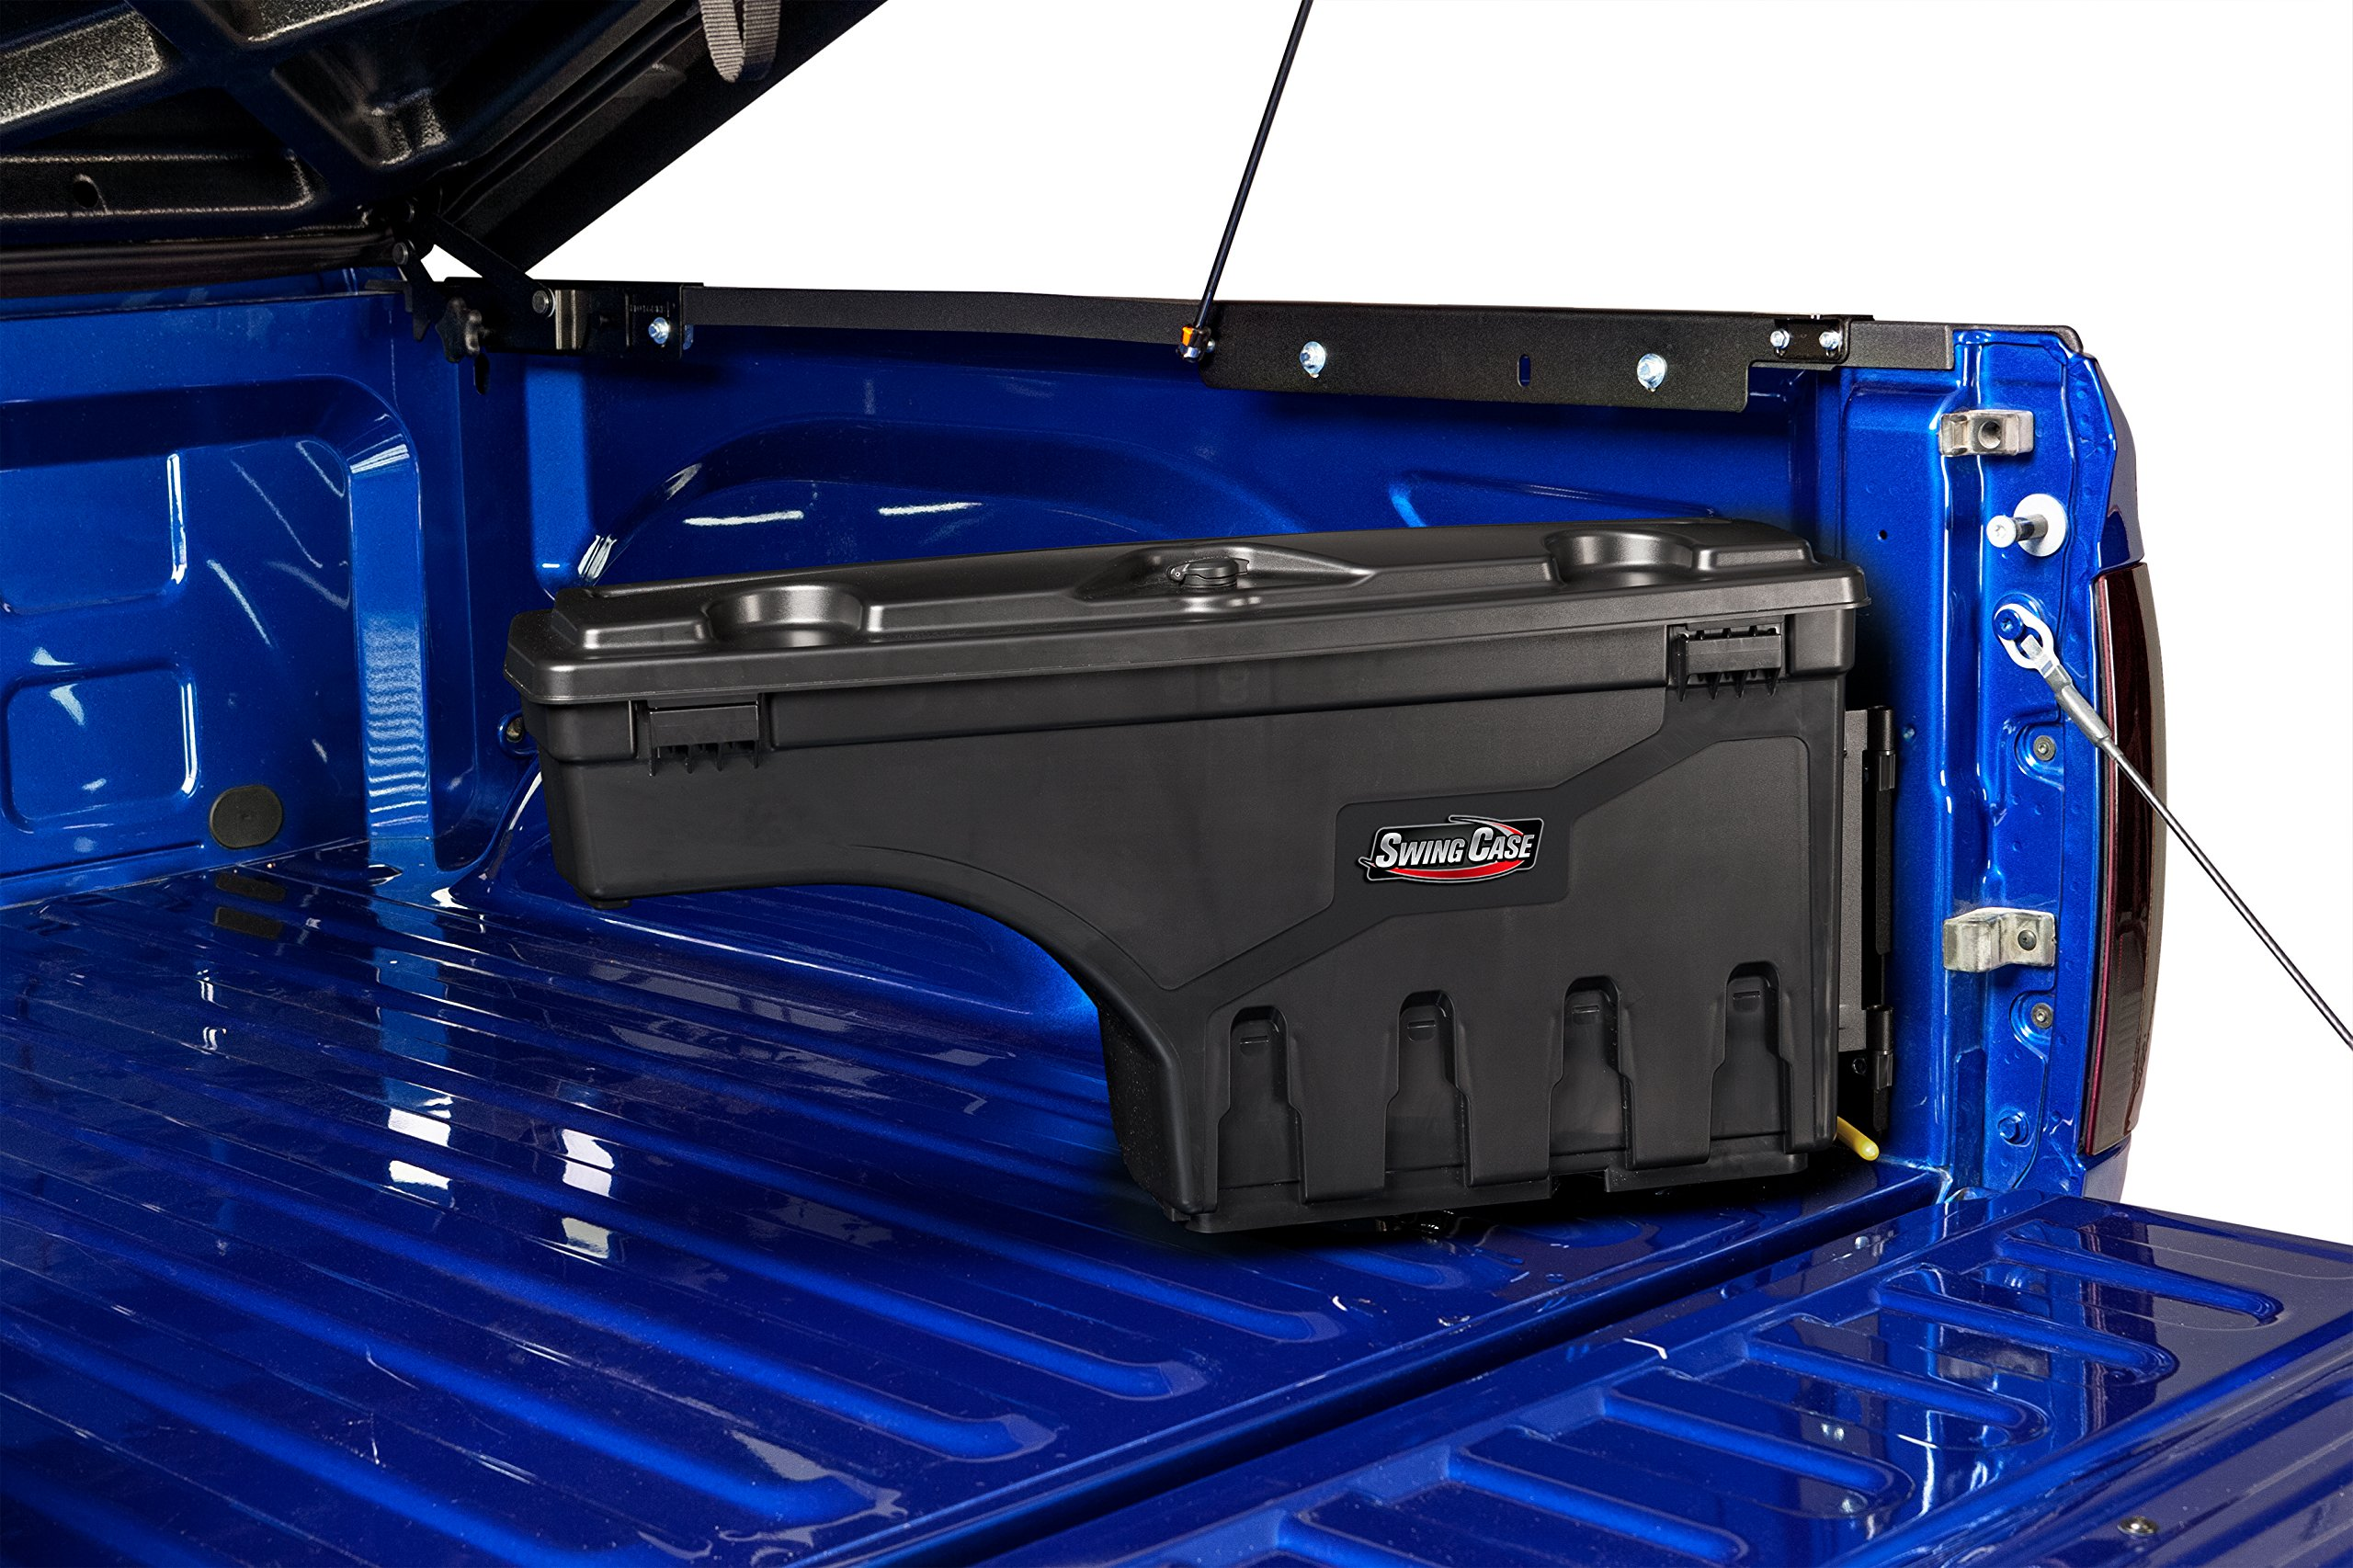 UnderCover SwingCase Truck Bed Storage Box   SC100D   fits 2007-2018 & 2019 Chevrolet Silverado/GMC Sierra 1500-3500 Driver Side by UNDERCOVER